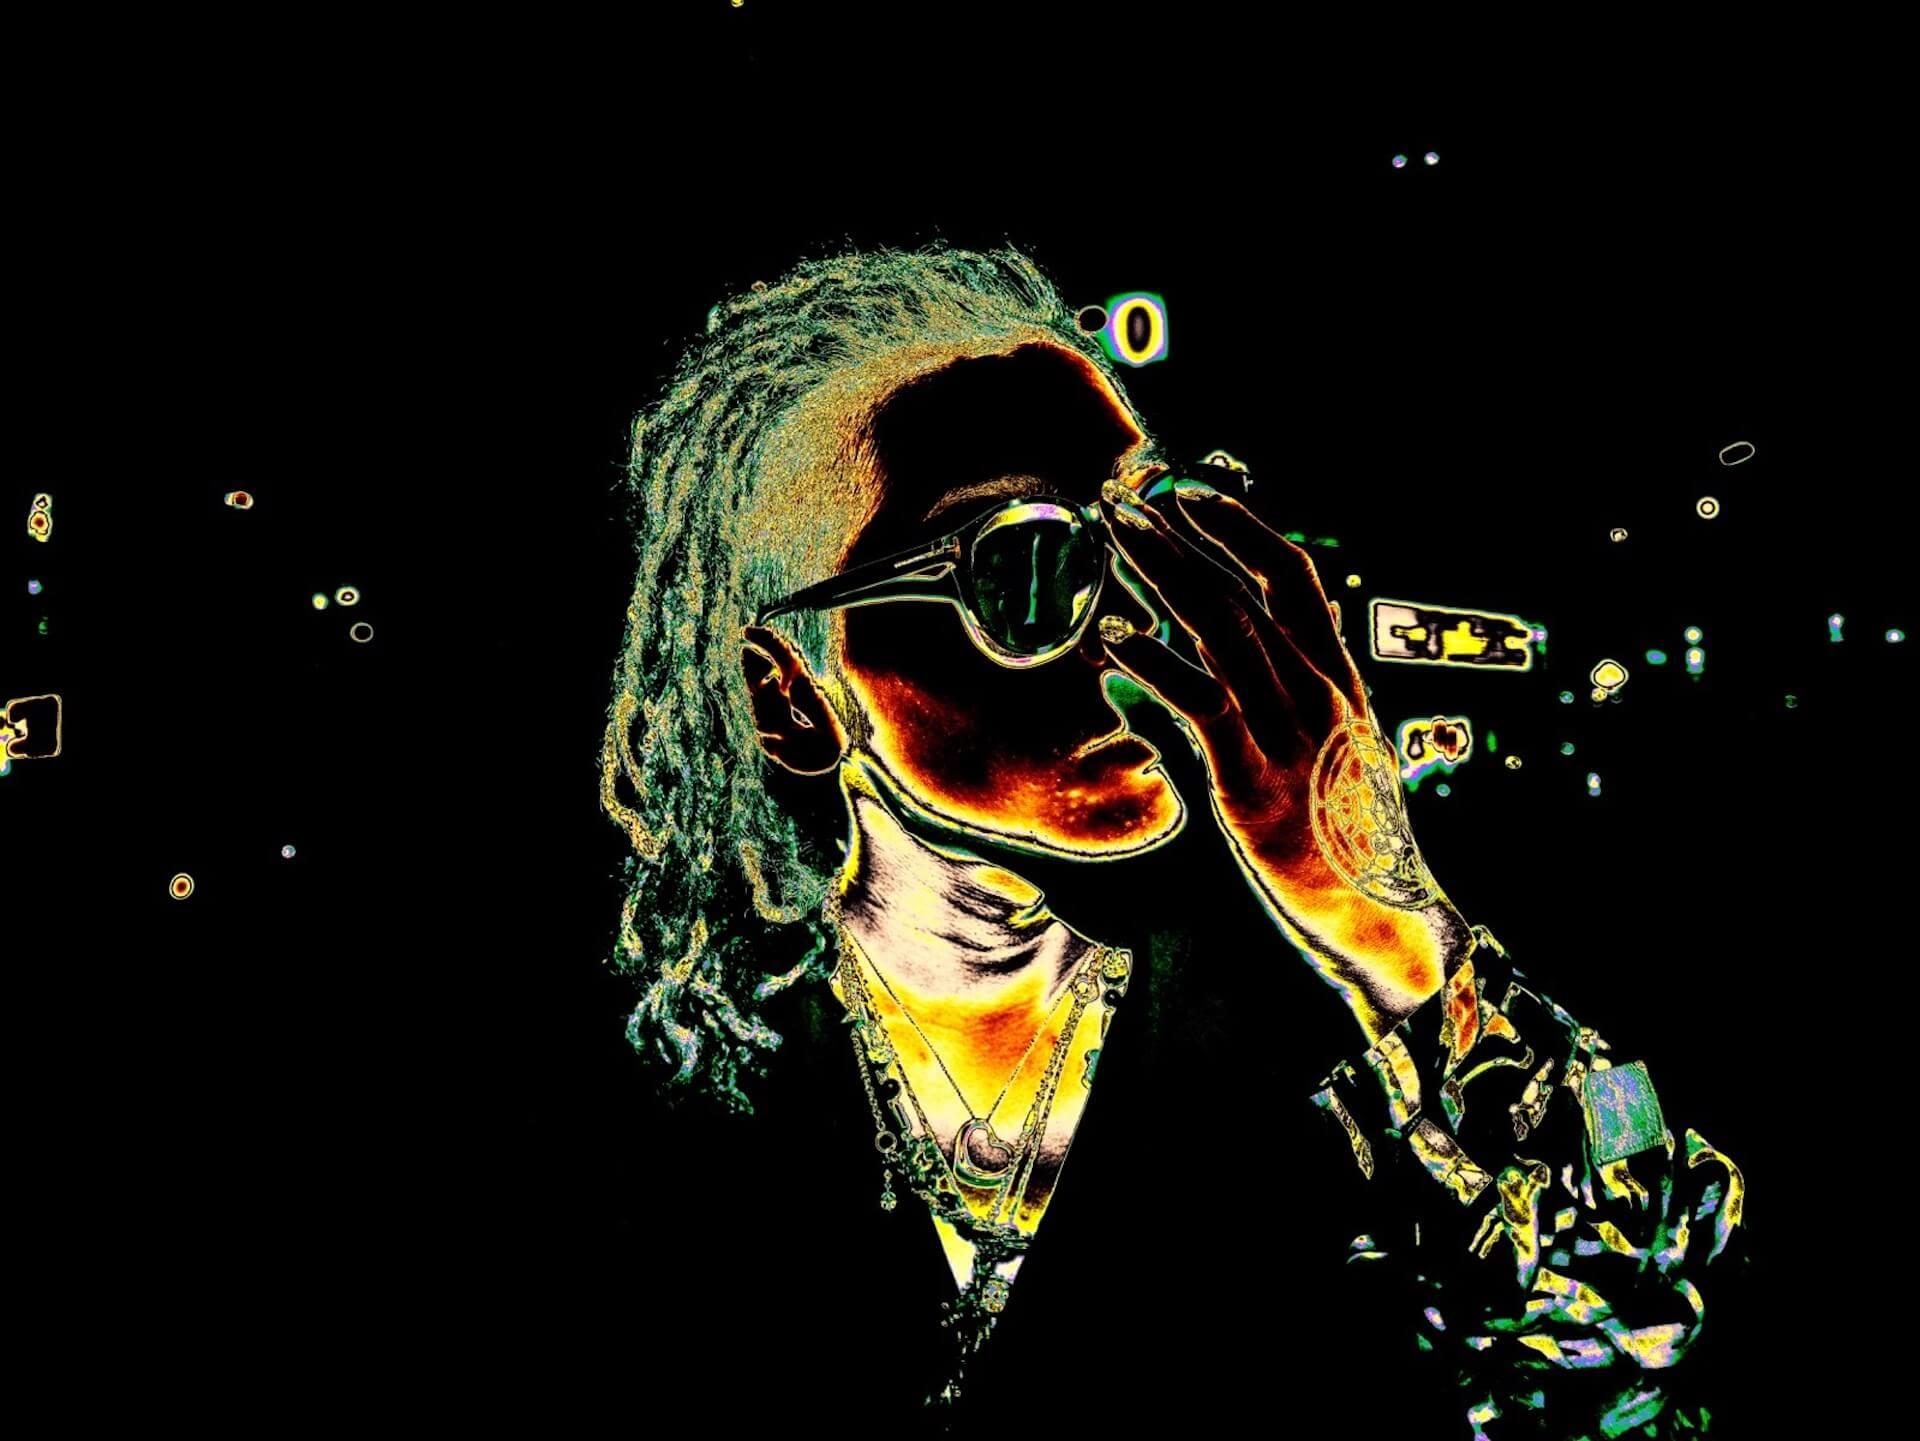 "SANTAWORLDVIEWのEP『IKIGAI 2』収録曲""Magnificent(feat. Leon Fanourakis)""のMVがプレミア公開決定! music210612_santaworldview_mv_2"